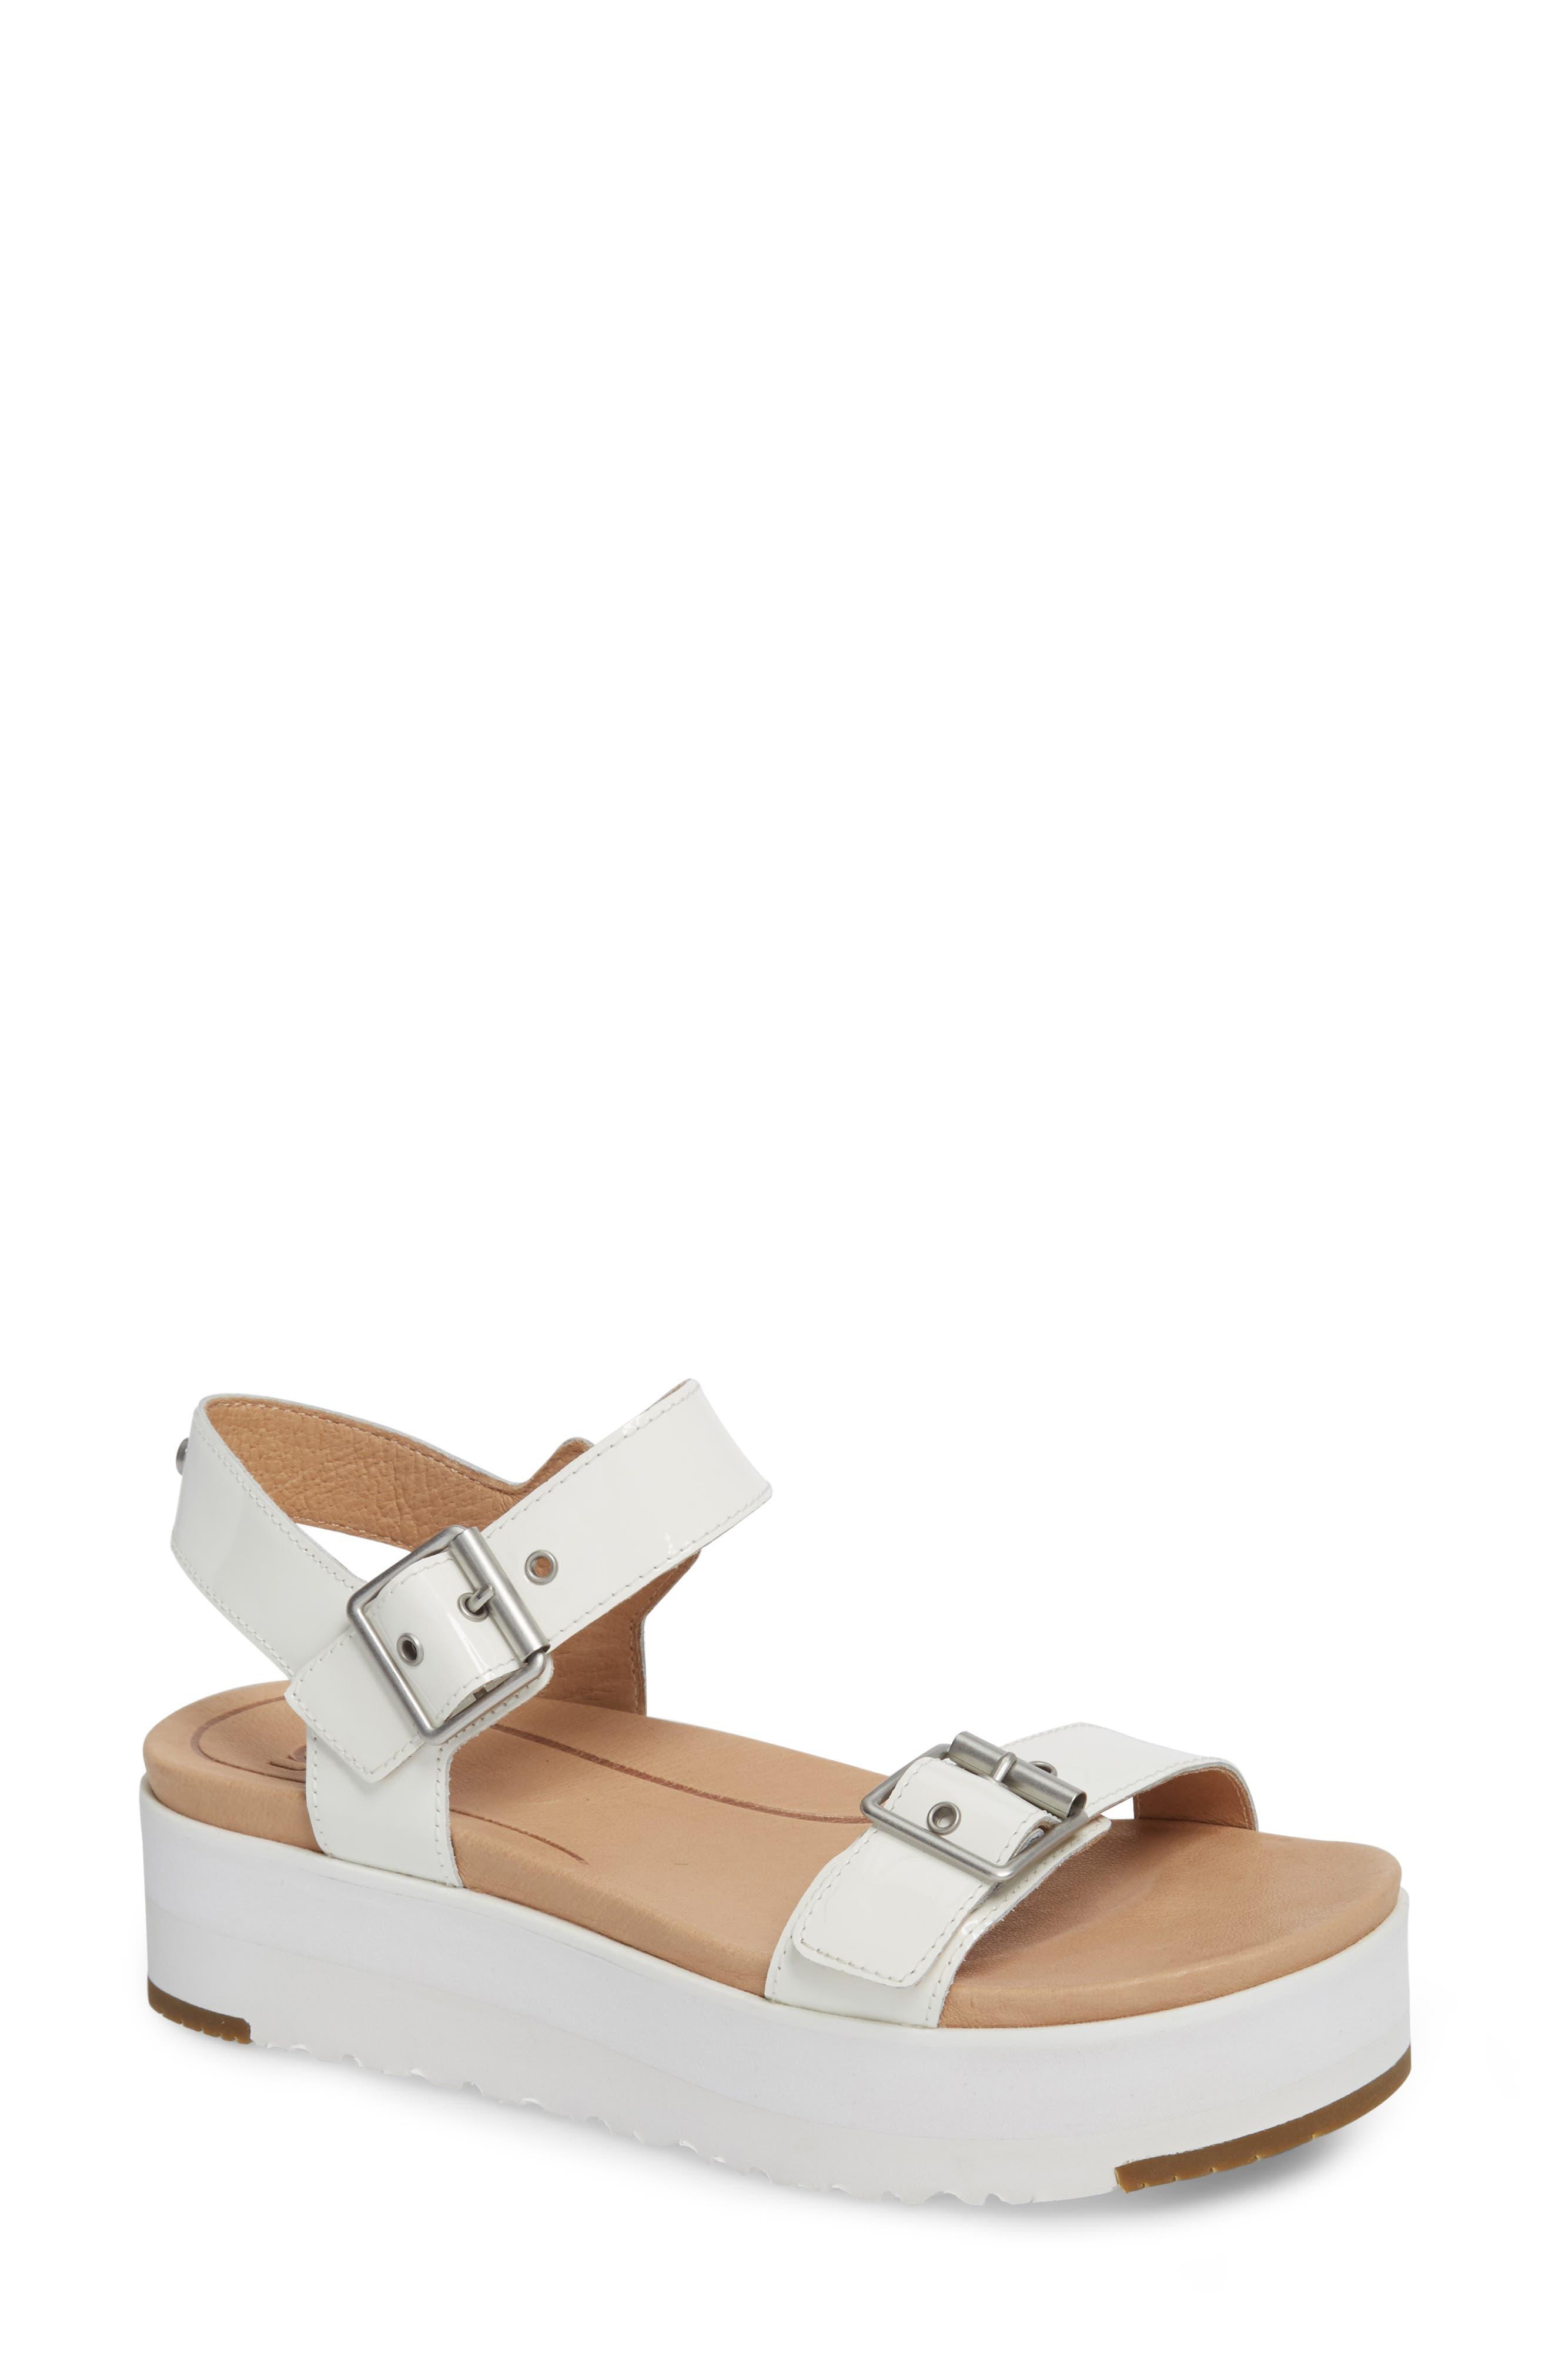 Angie Platform Sandal,                             Main thumbnail 1, color,                             White Leather